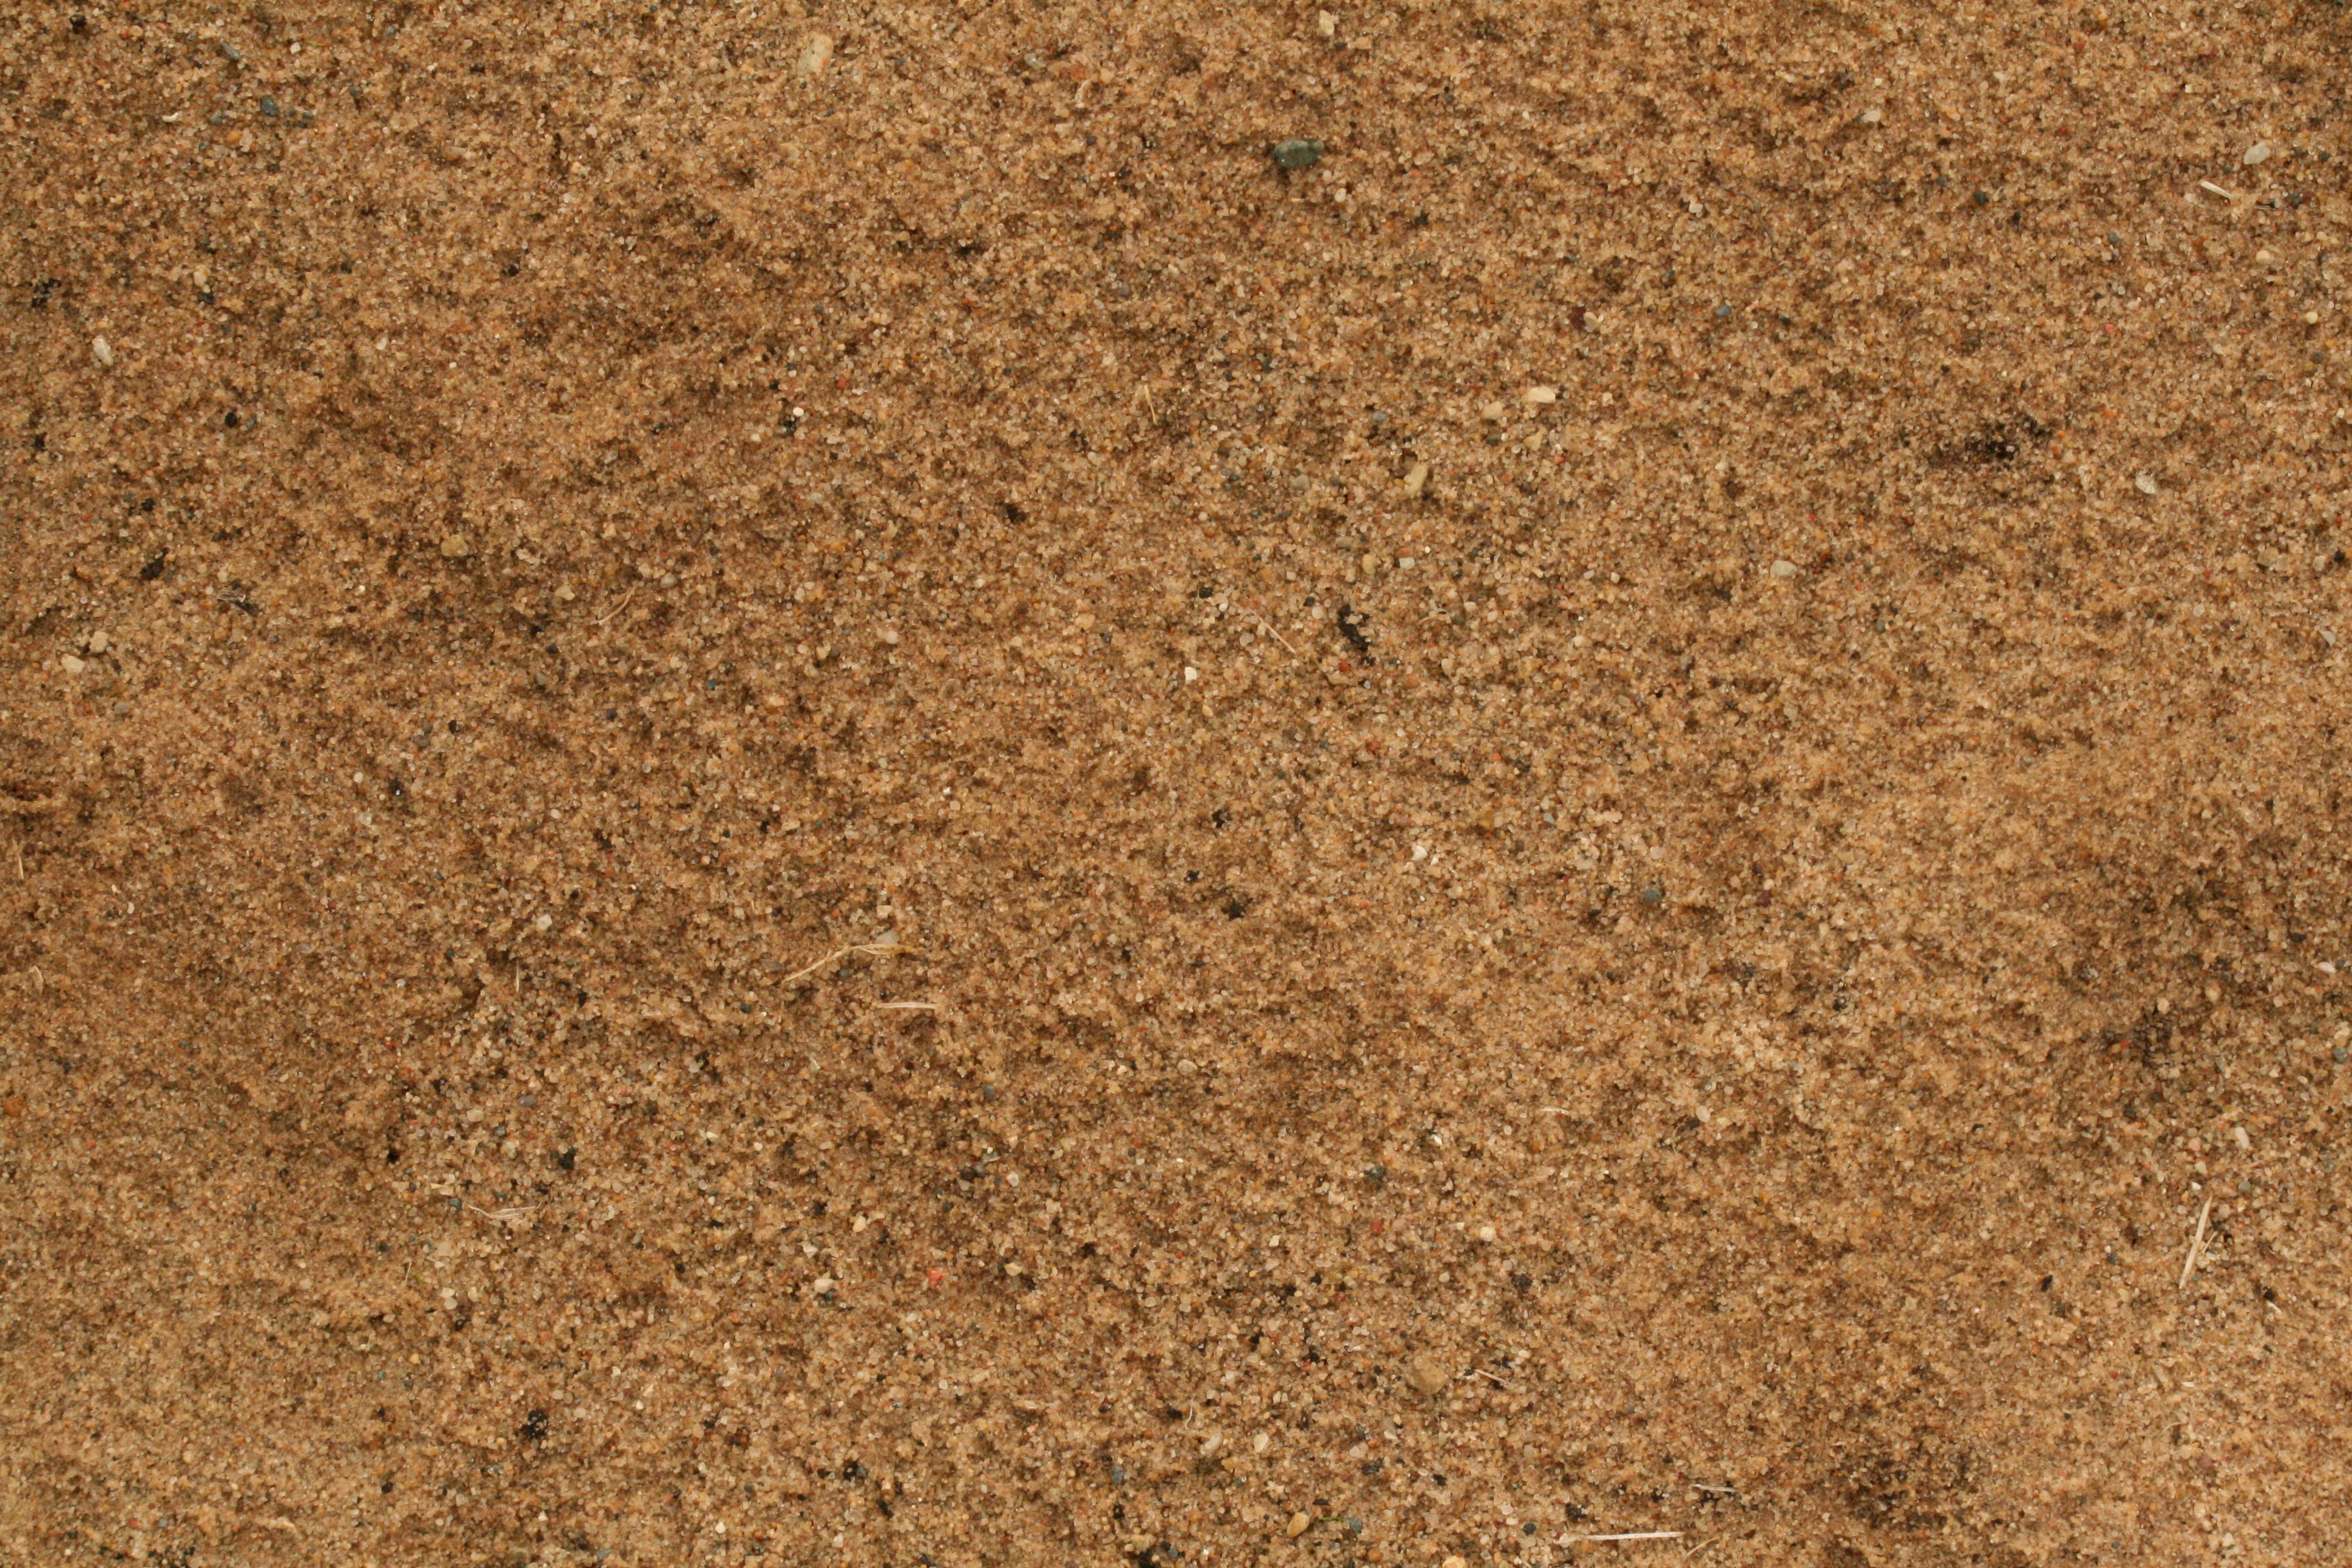 Sand Textures | Texturemate.com